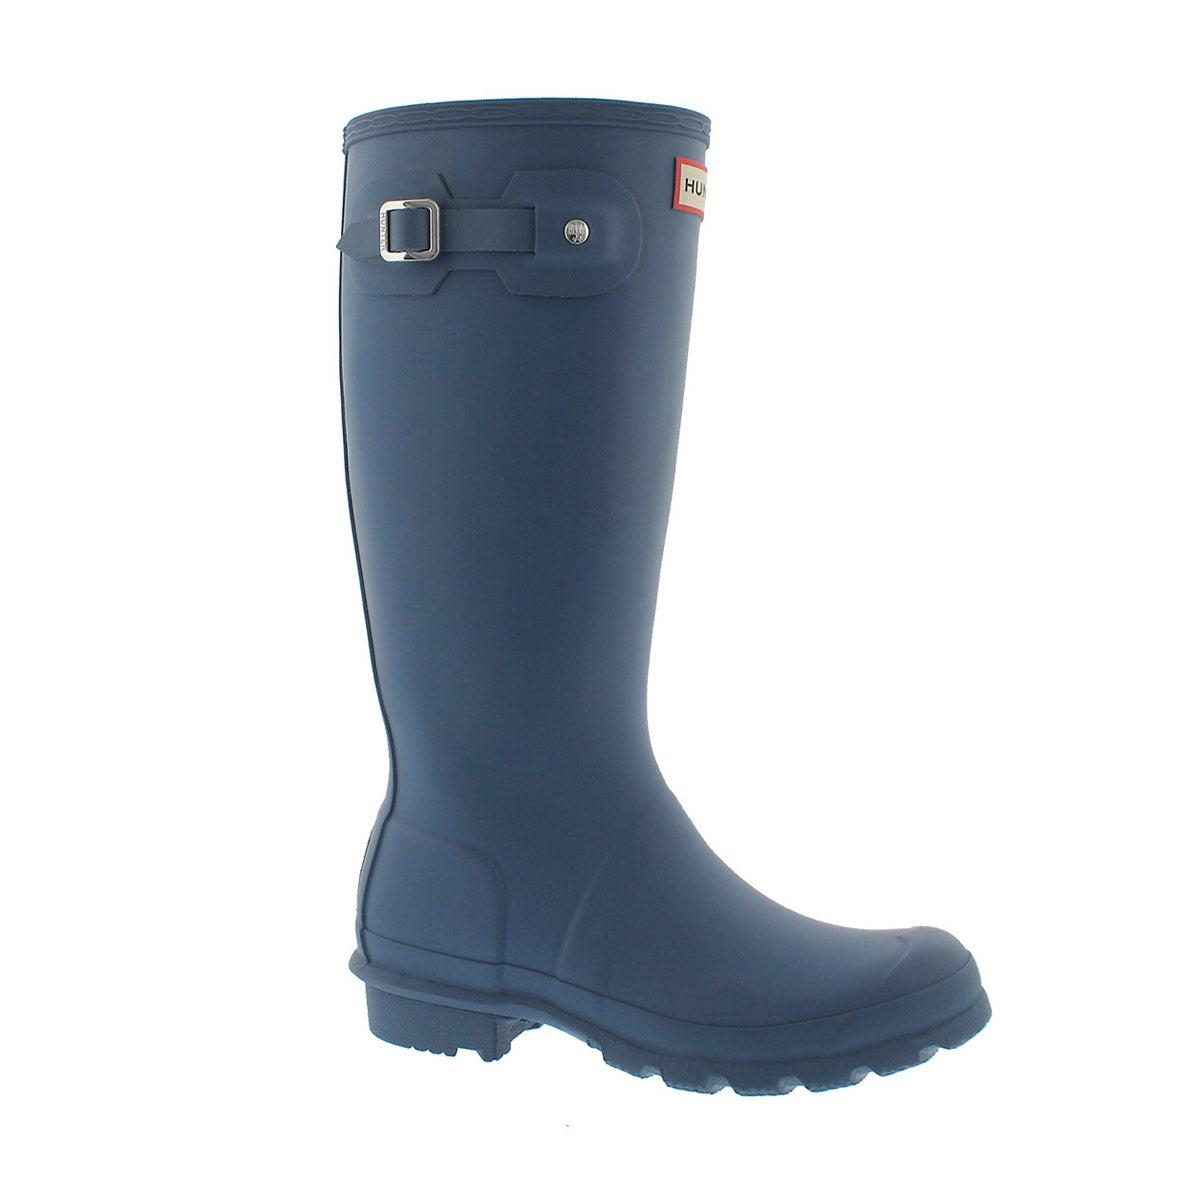 Girls' ORIGINAL YOUNG earth blue rain boots